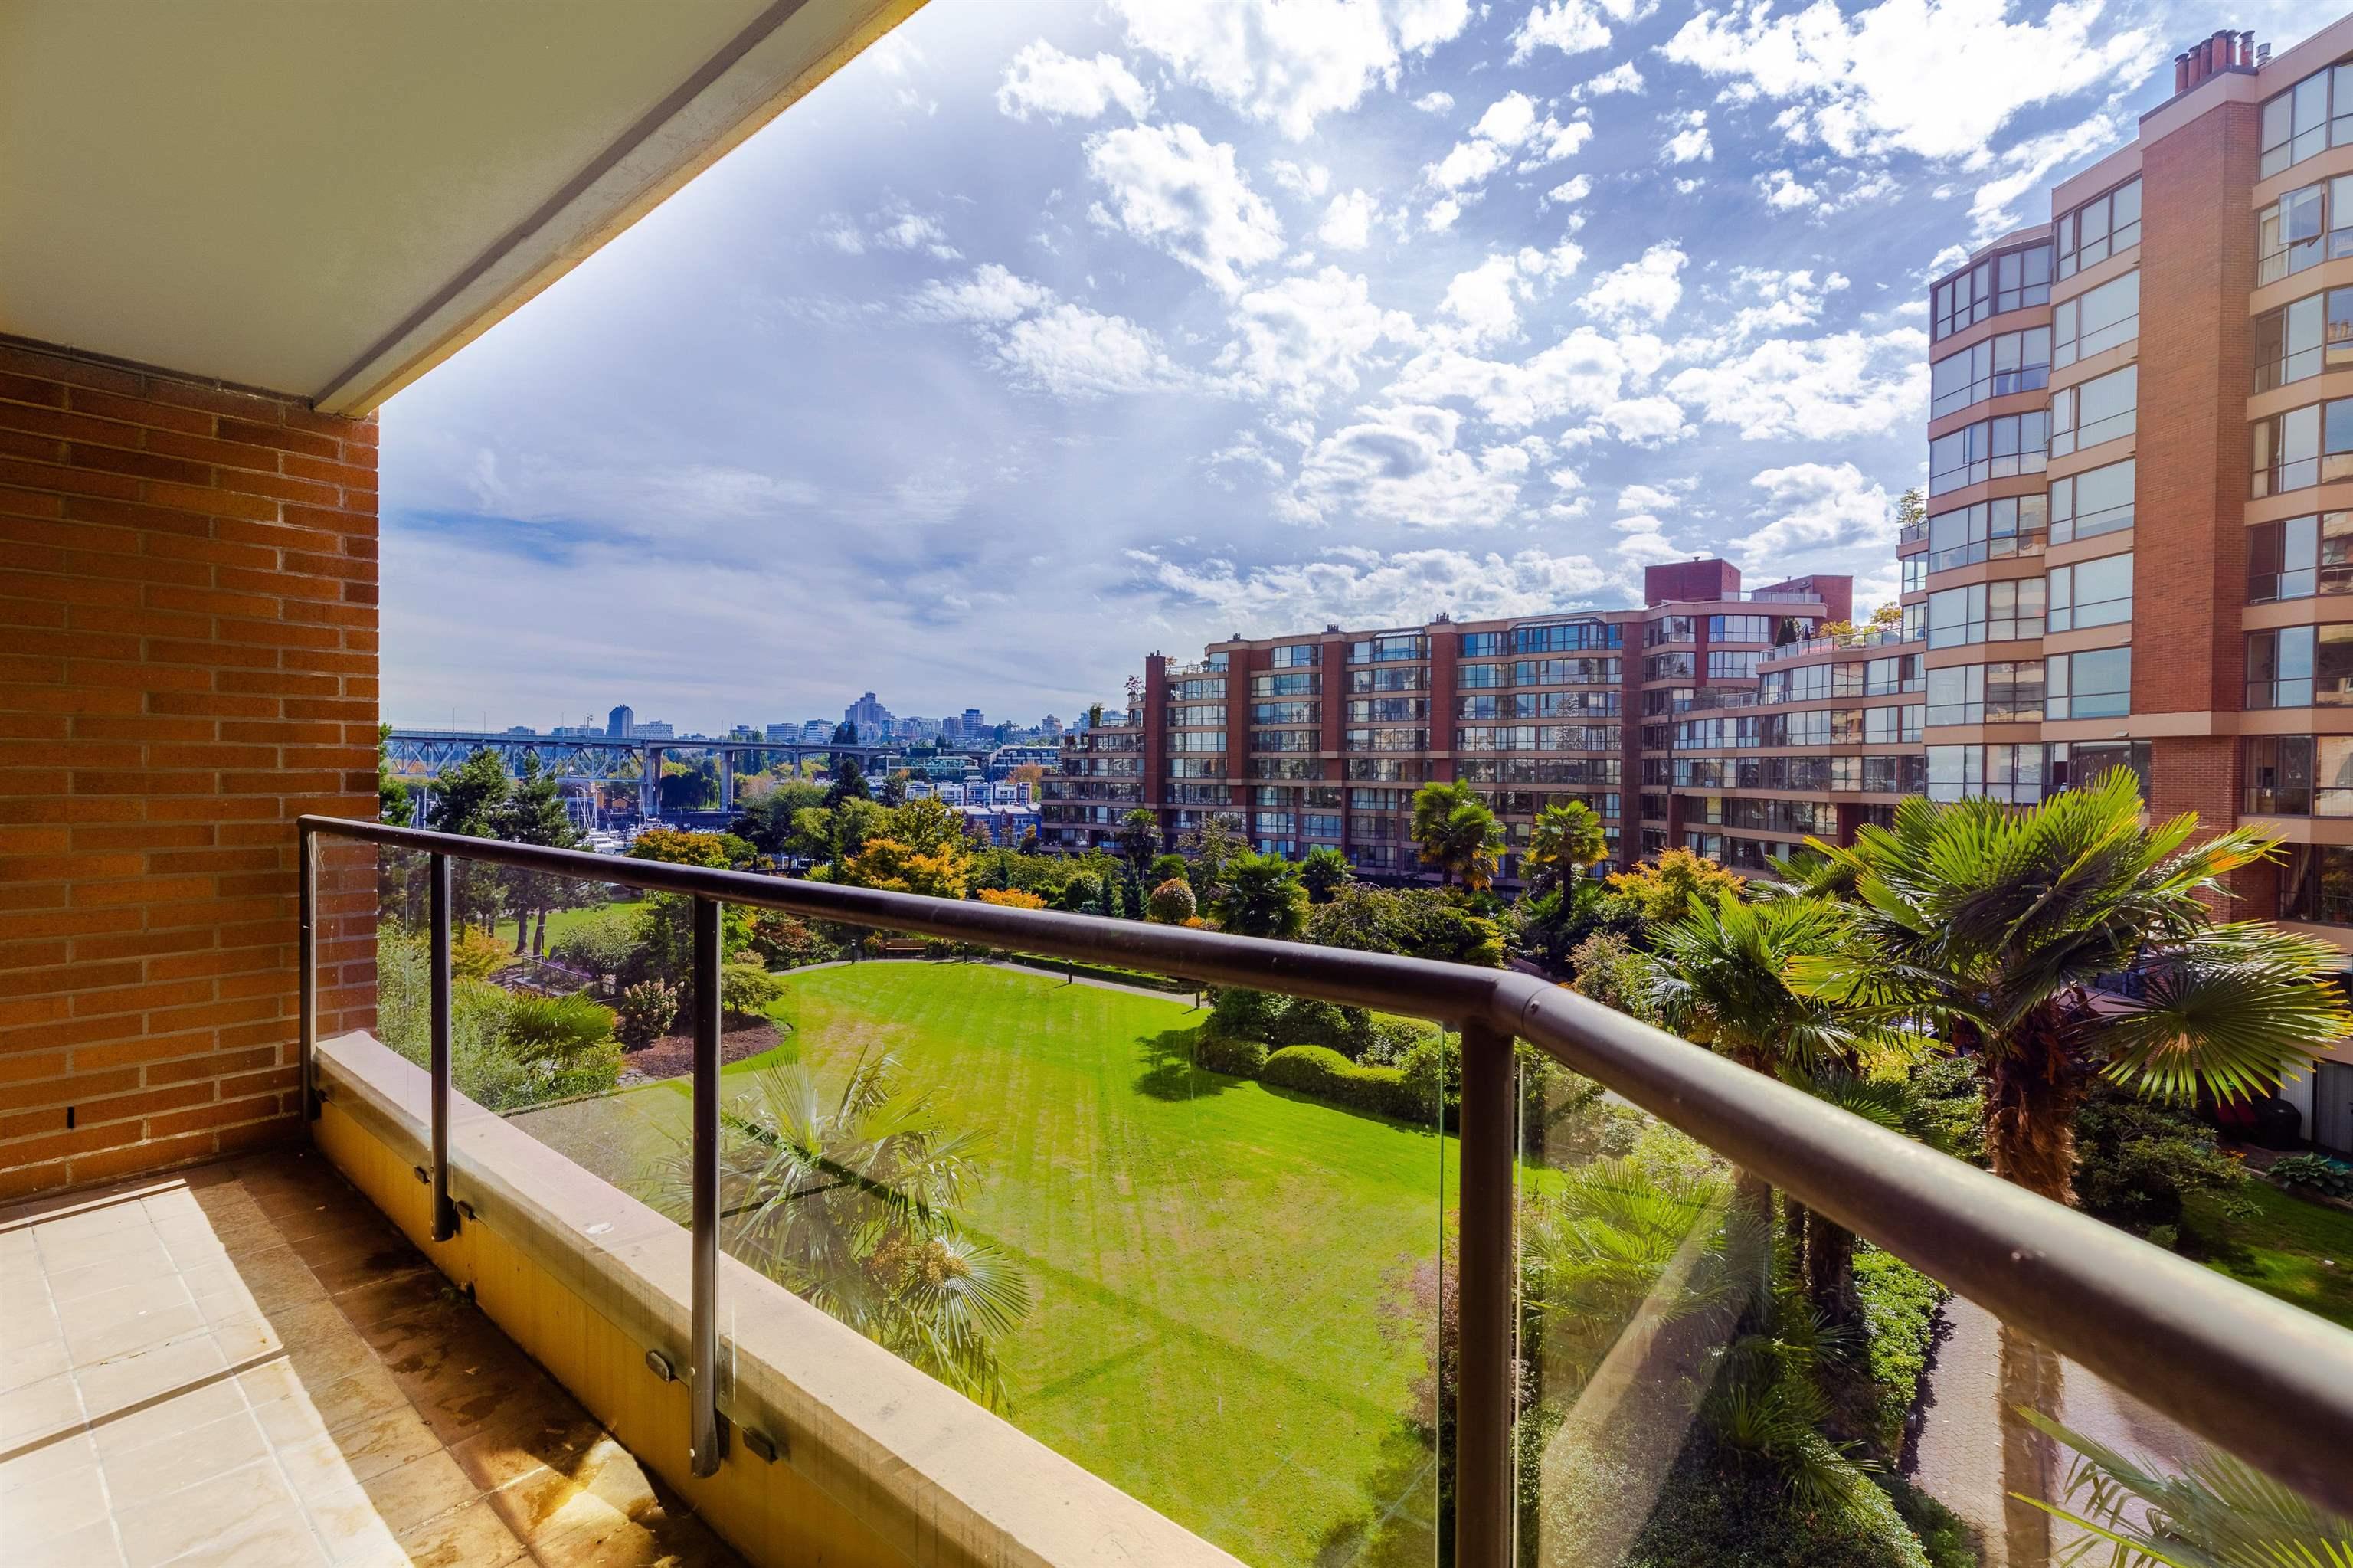 406 1450 PENNYFARTHING DRIVE - False Creek Apartment/Condo for sale, 2 Bedrooms (R2617259) - #36